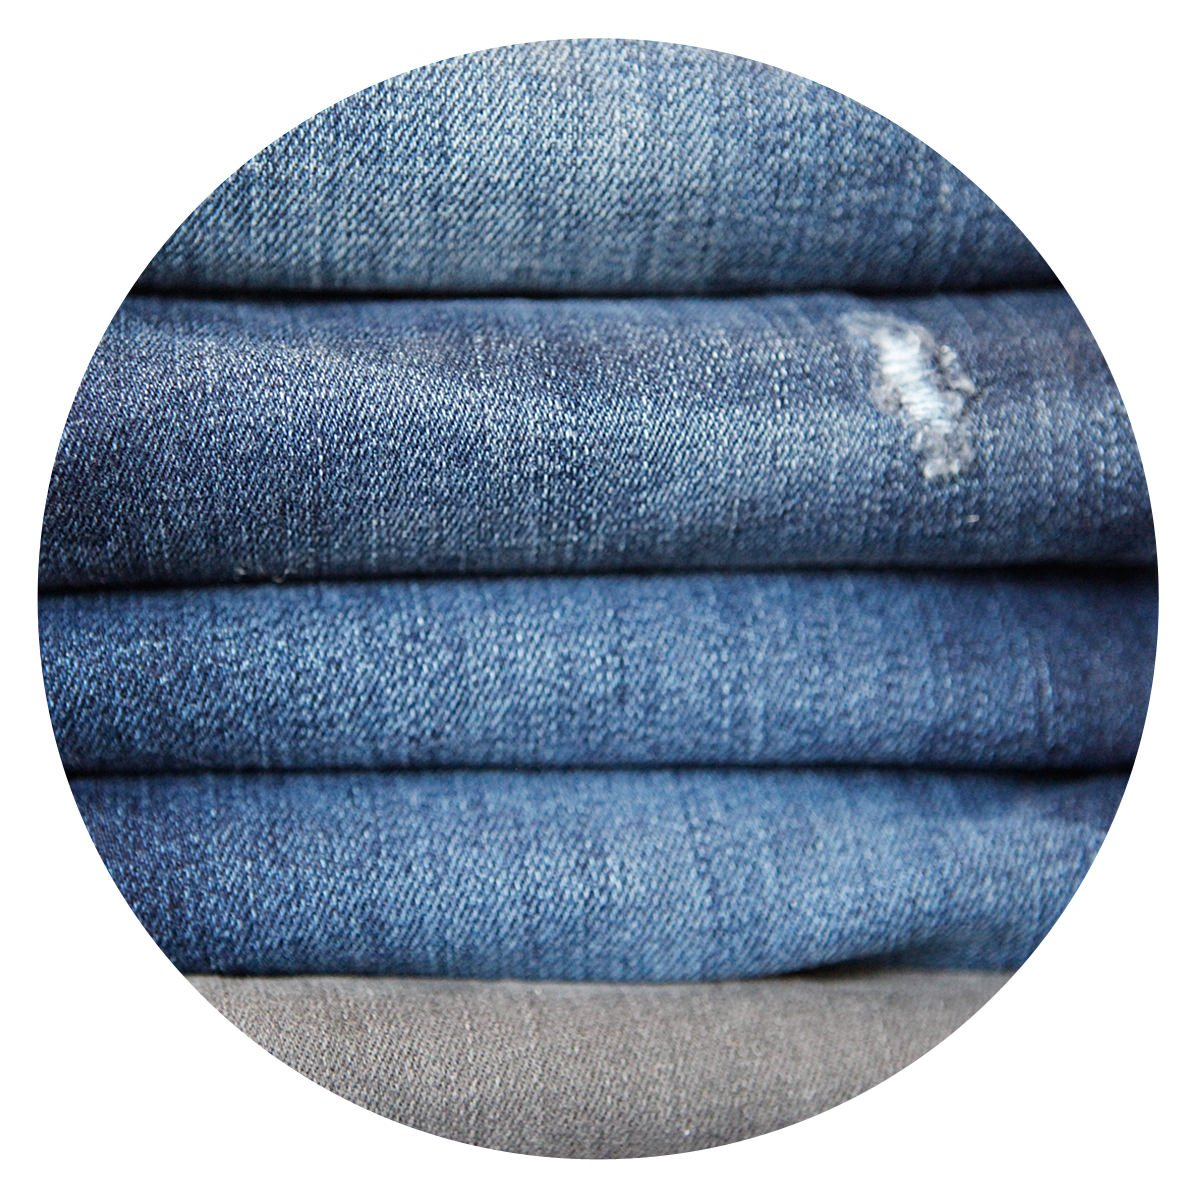 Close-Up Picture of Denim Textures